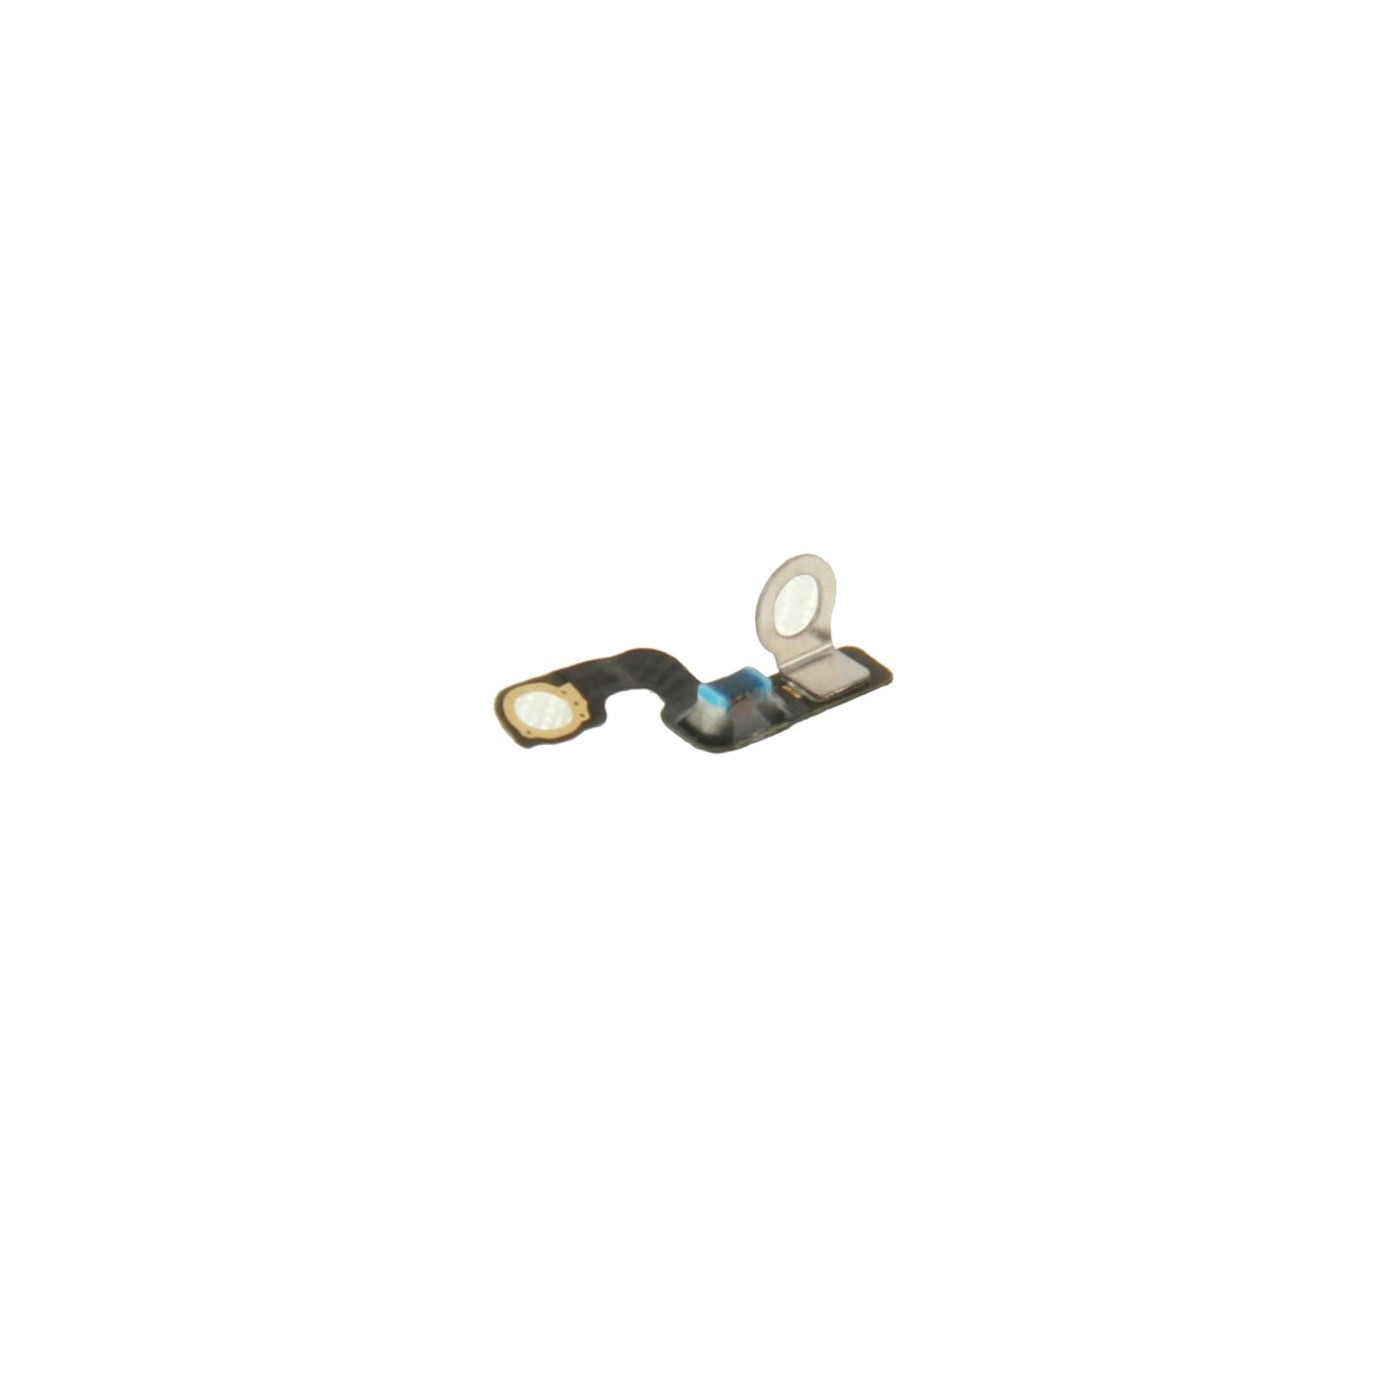 flex cable connector flex cable for iPhone 6 plus room - 6s Plus